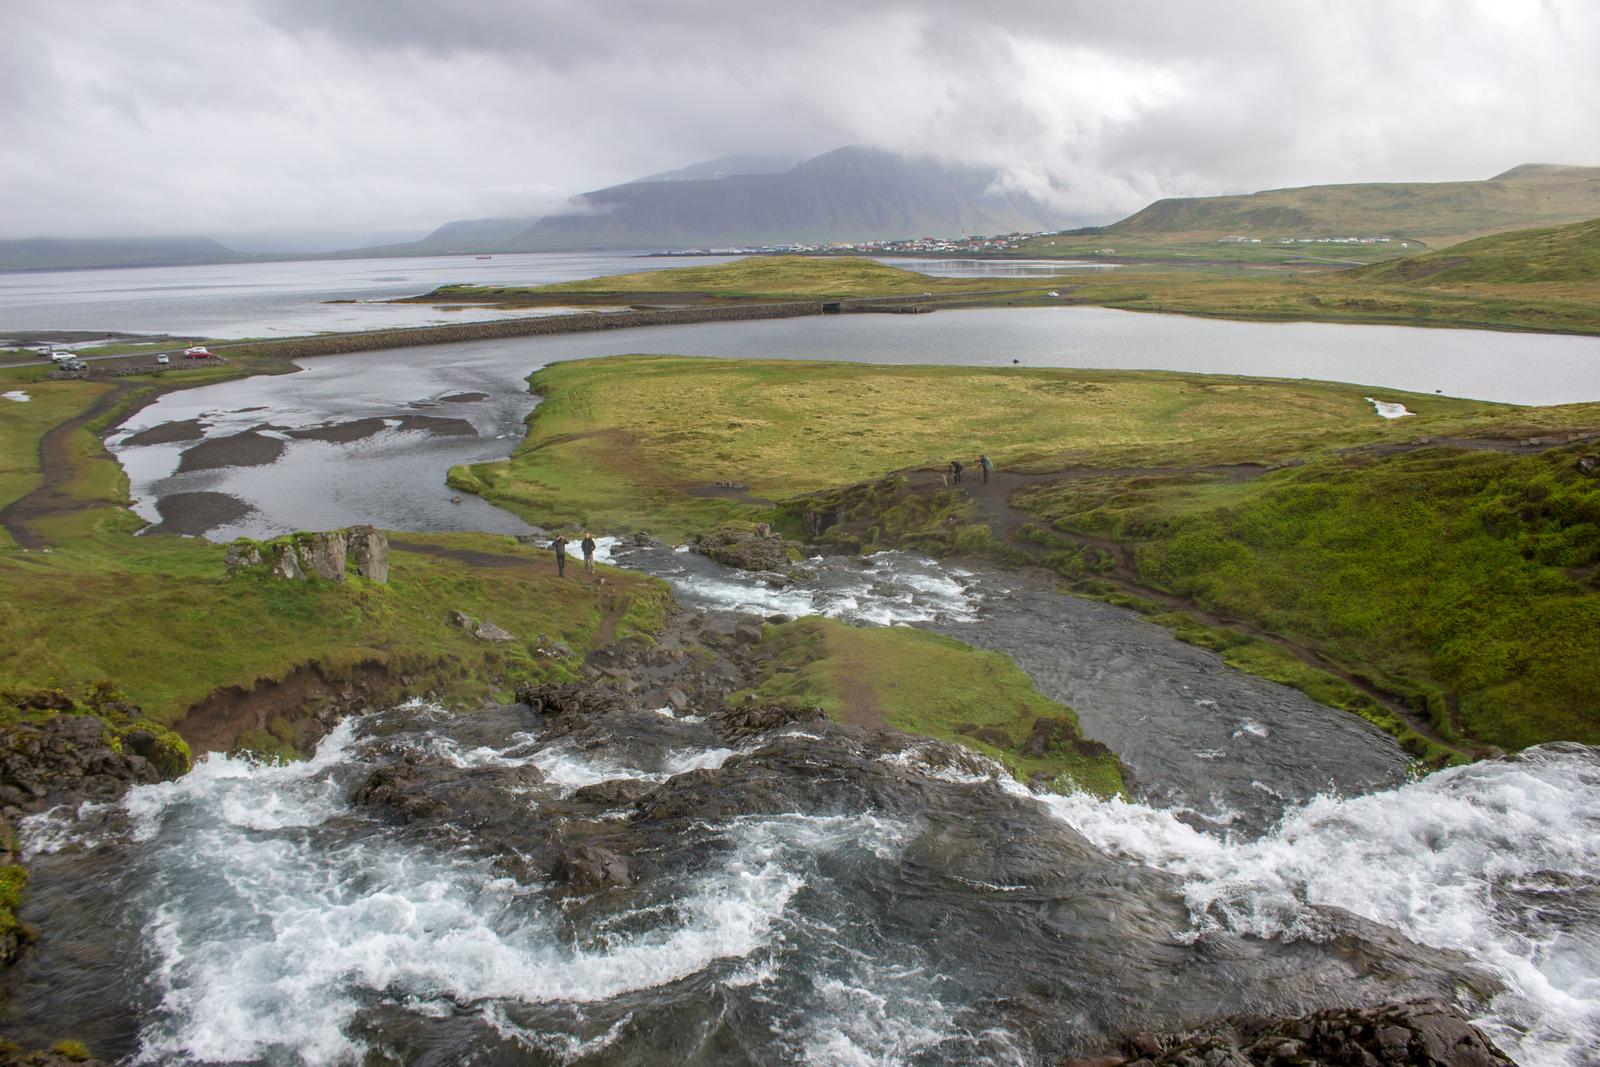 Kirkjufell near Grundarfjordur. Snæfellsnes Peninsula Iceland Day Trip Travel Guide